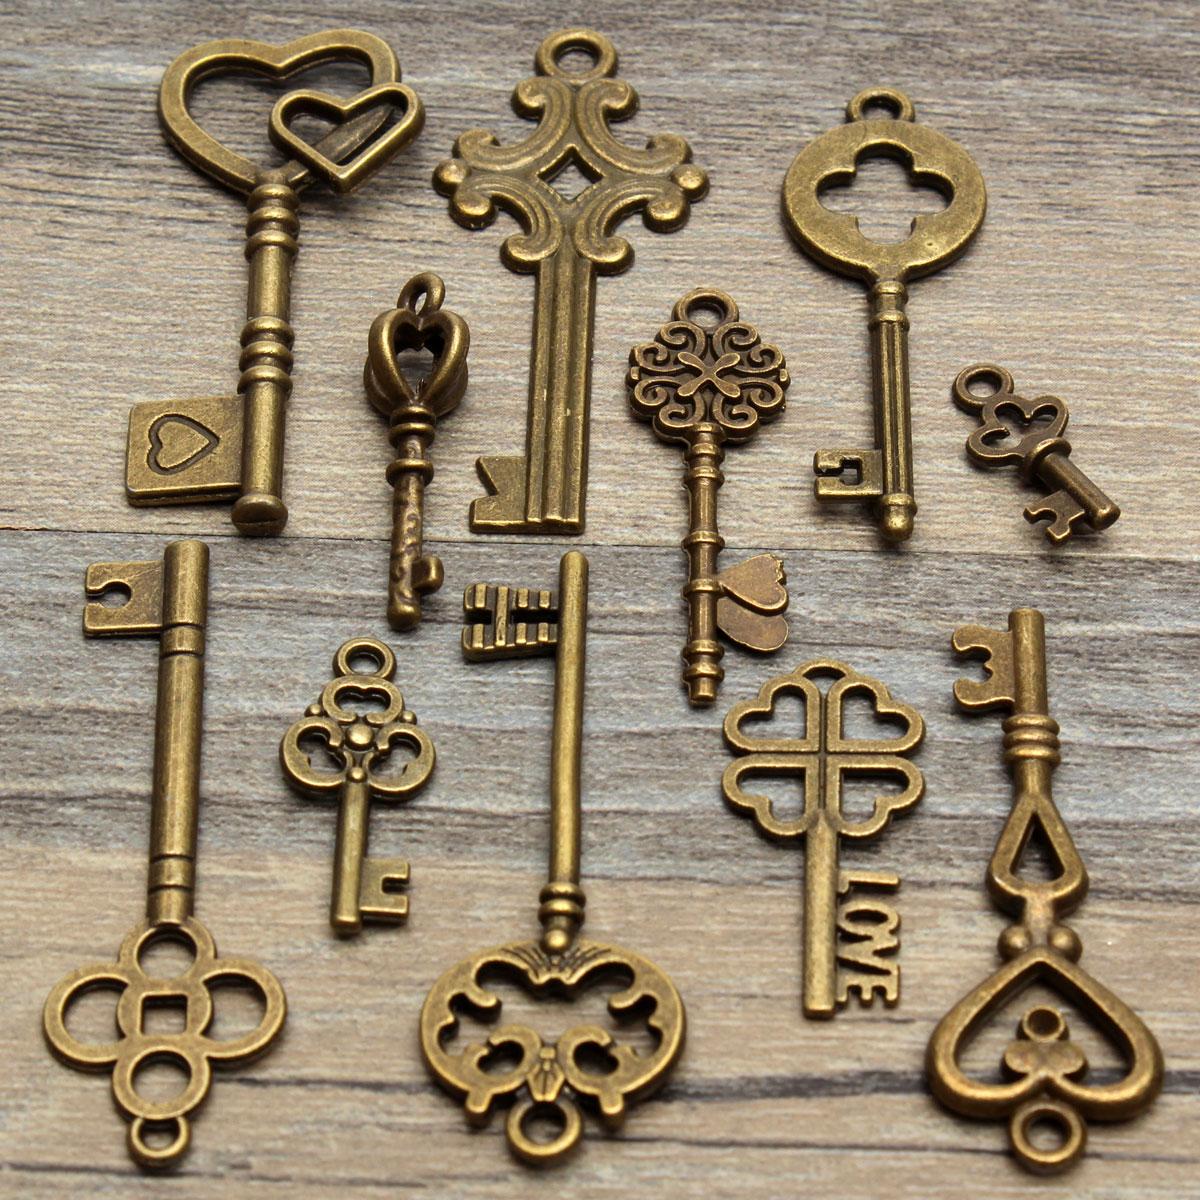 Set Of 11 Antique Vintage Old Look Skeleton Key Pendant Heart Bow Lock Steampunk Ebay